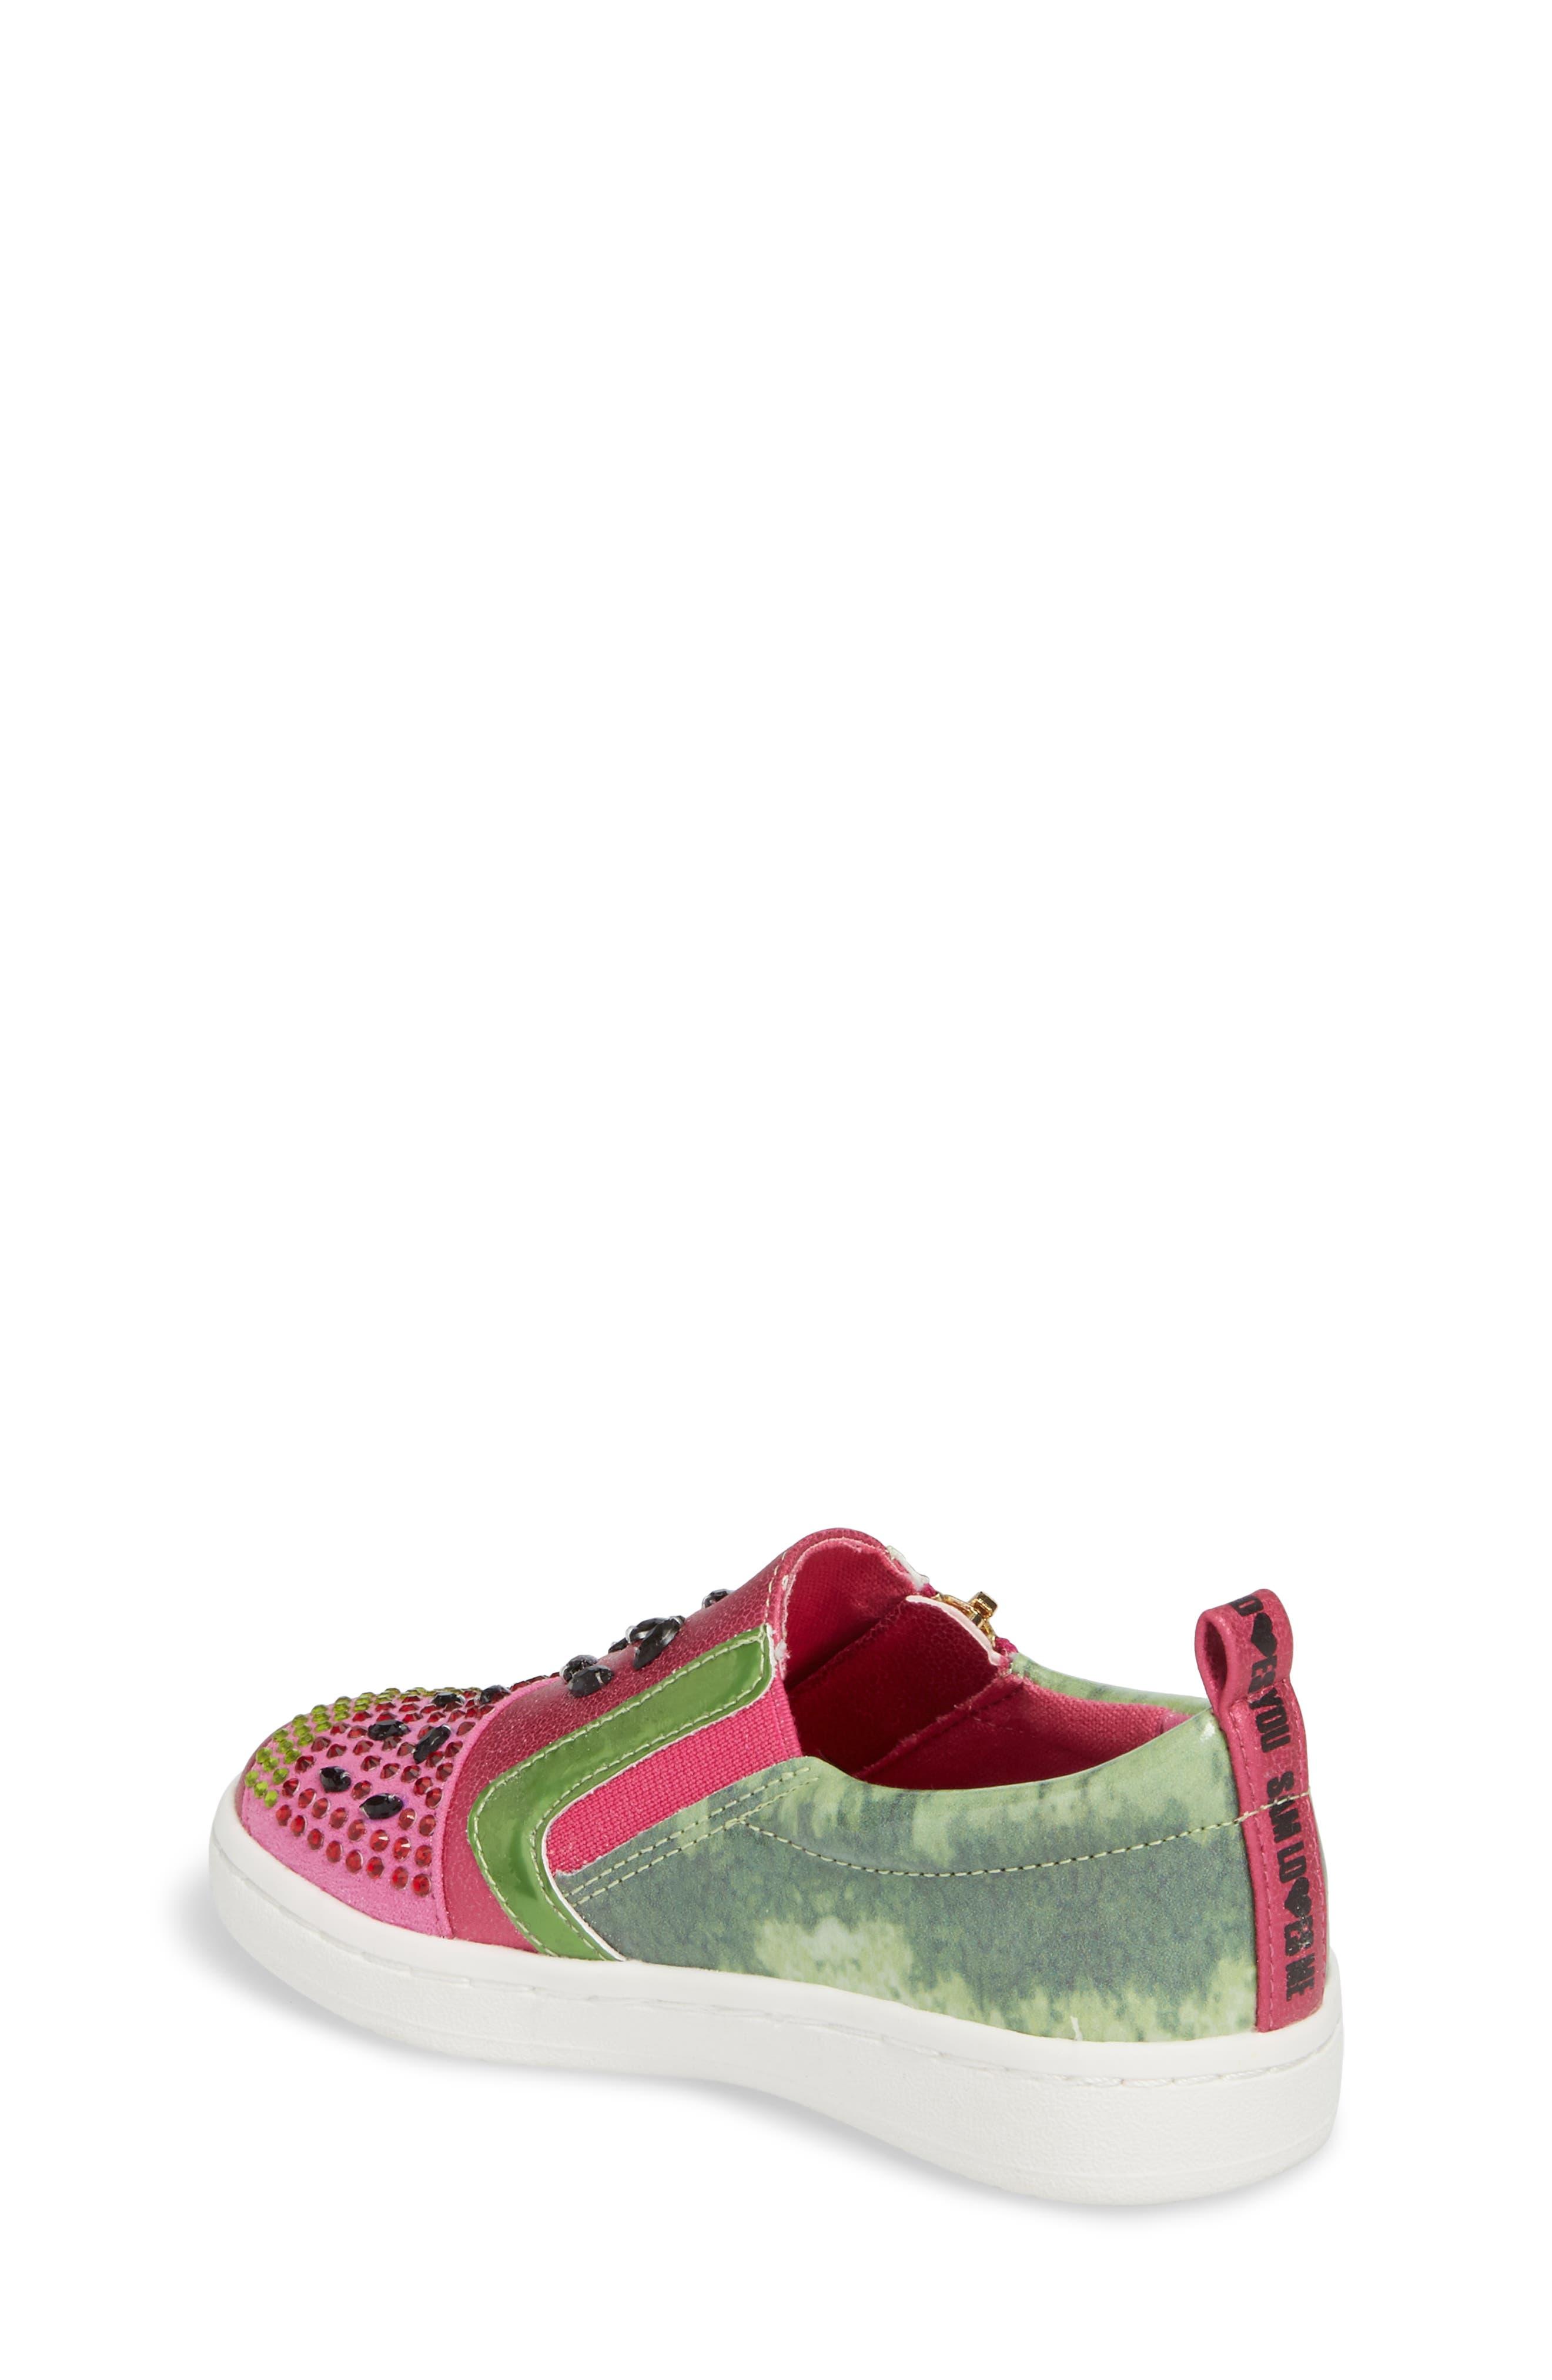 Blane Watermelon Sneaker,                             Alternate thumbnail 2, color,                             Fuchsia Patent Leather